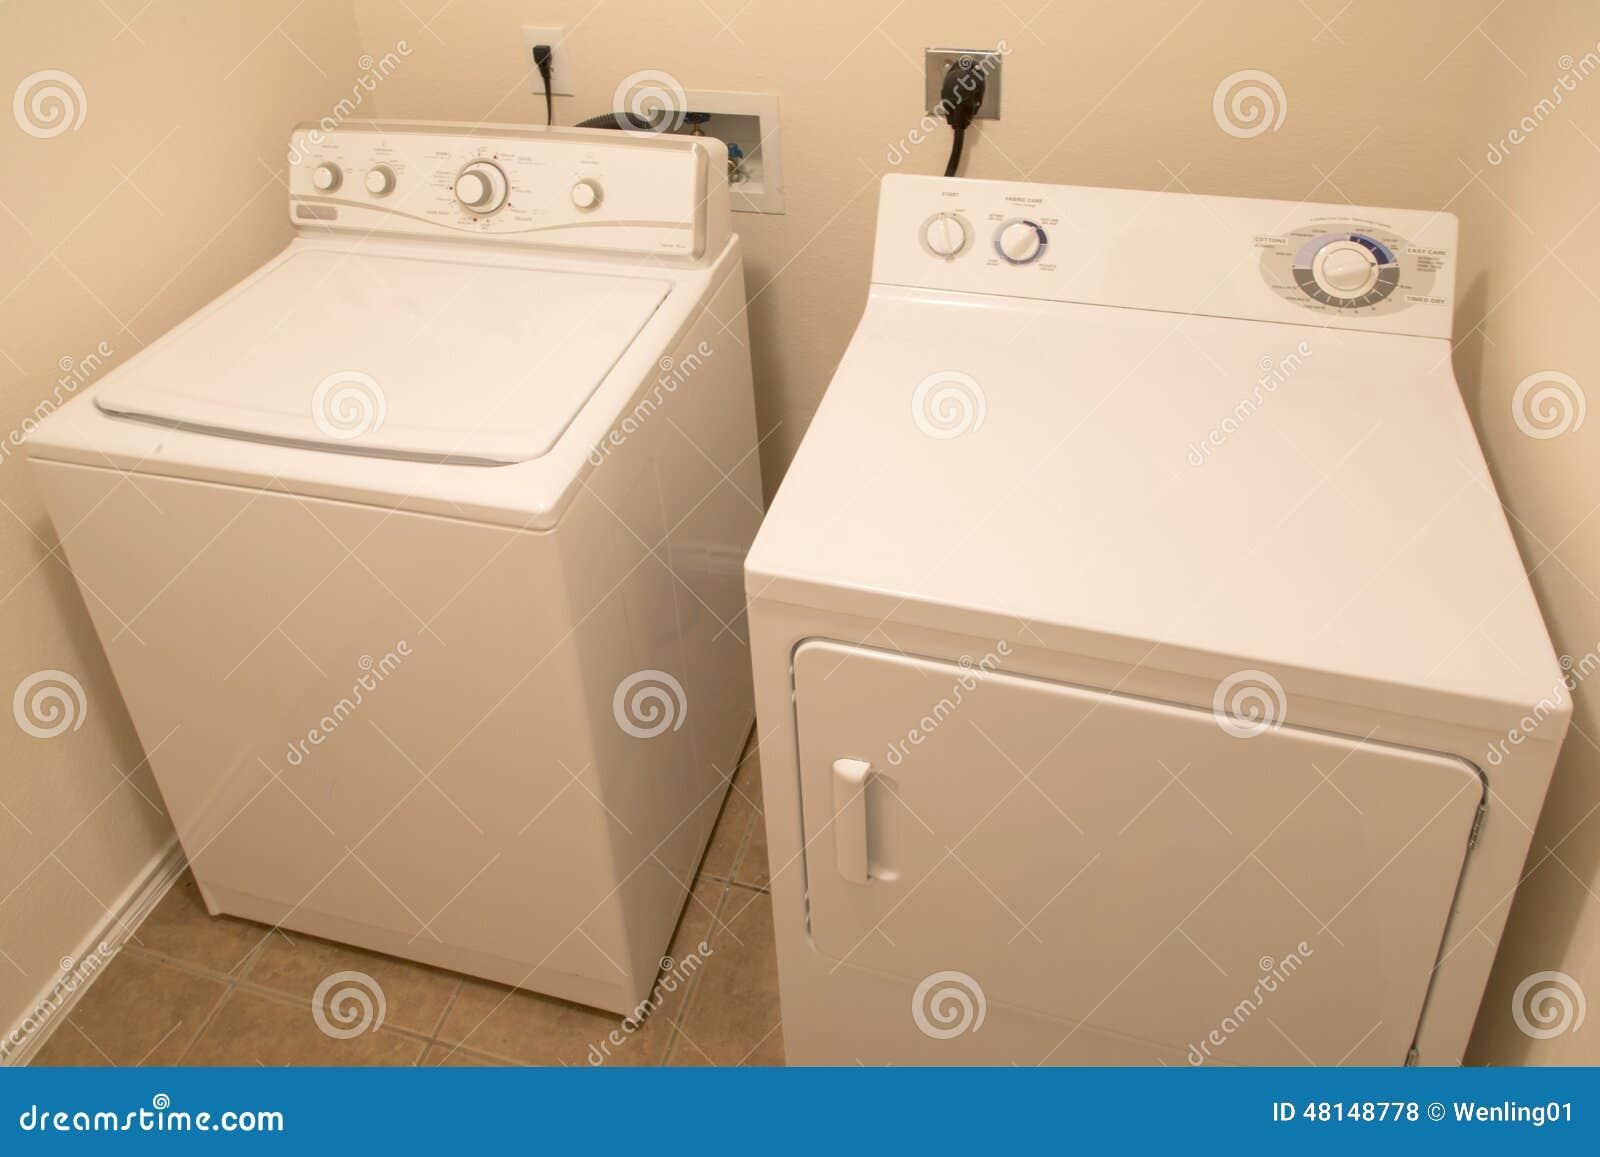 Washer and dryer in washroom background